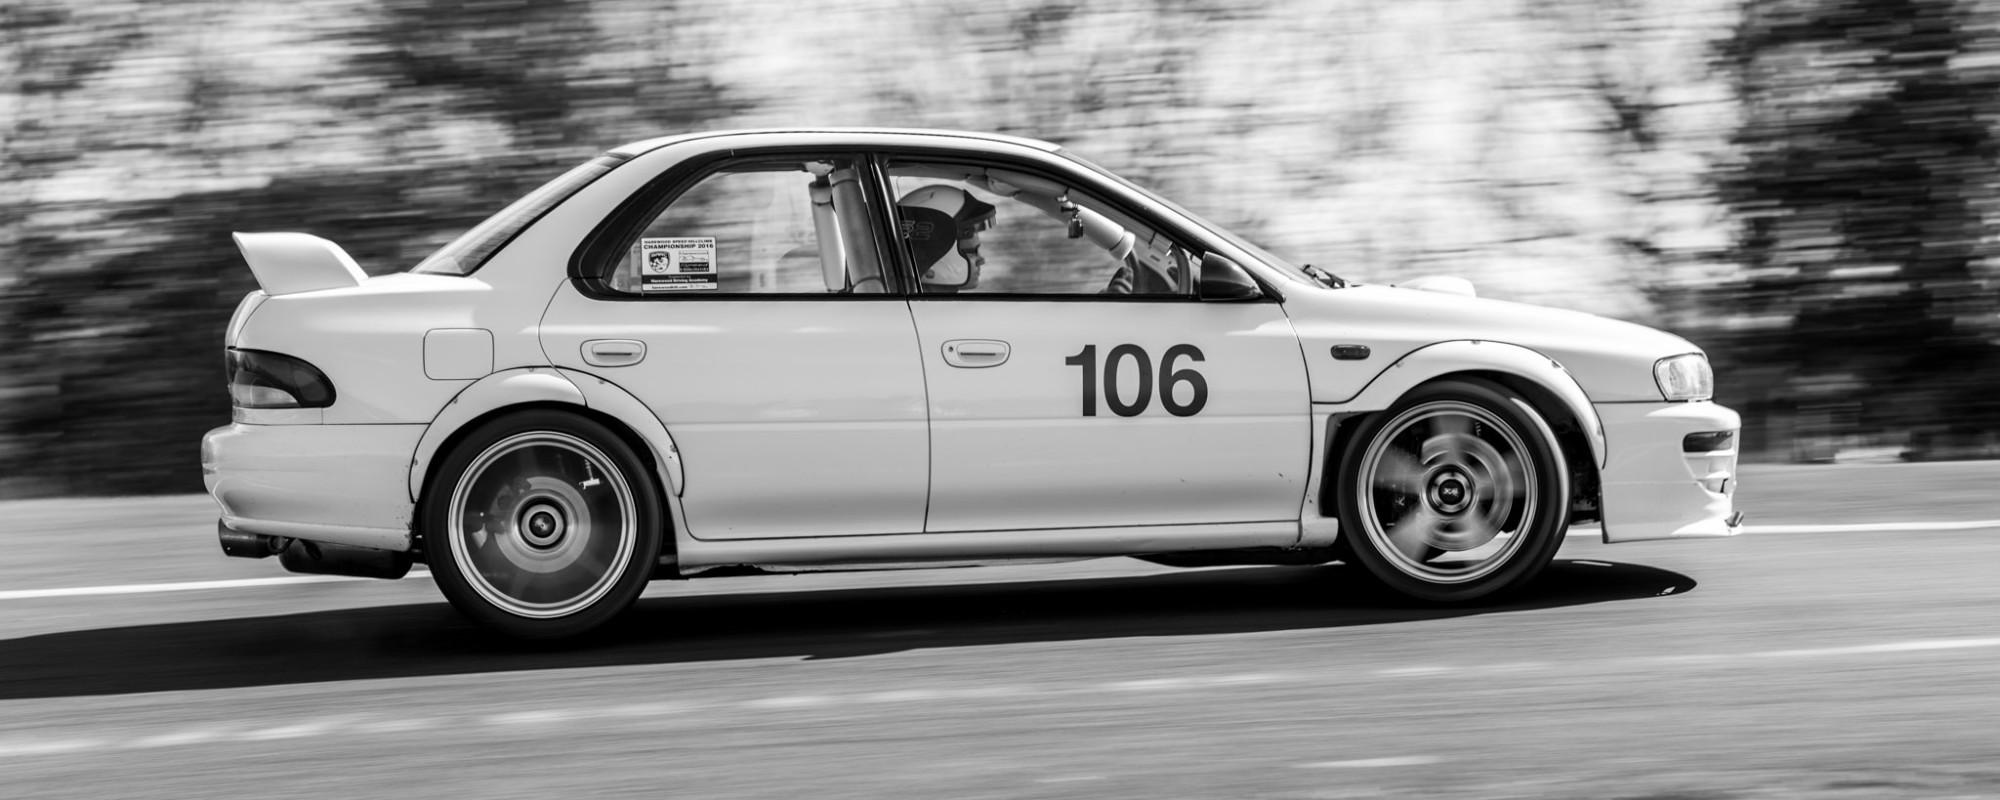 Subaru Impreza STI GC8 Harewood Hillclimb Cornering Fast